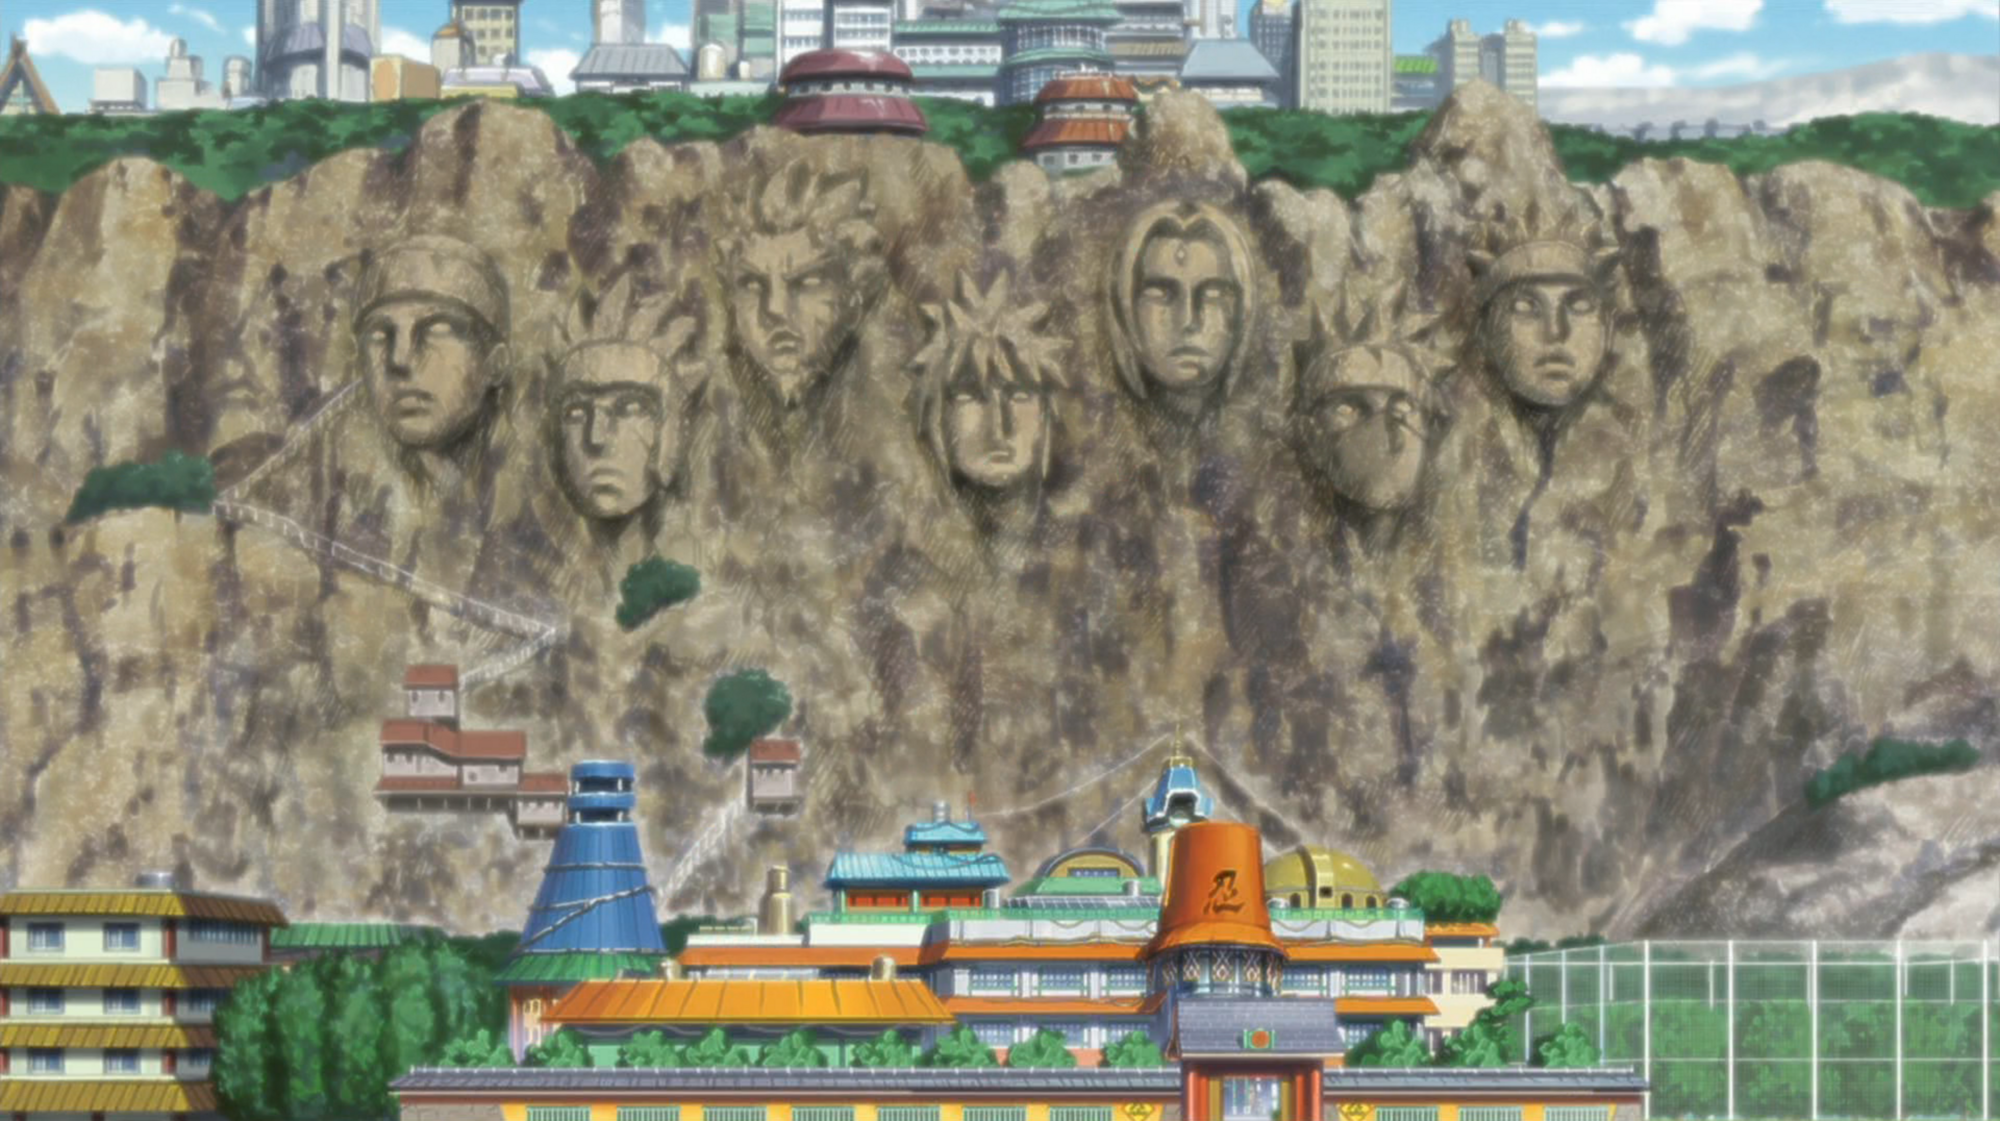 Hokage Rock | Narutopedia | FANDOM powered by Wikia